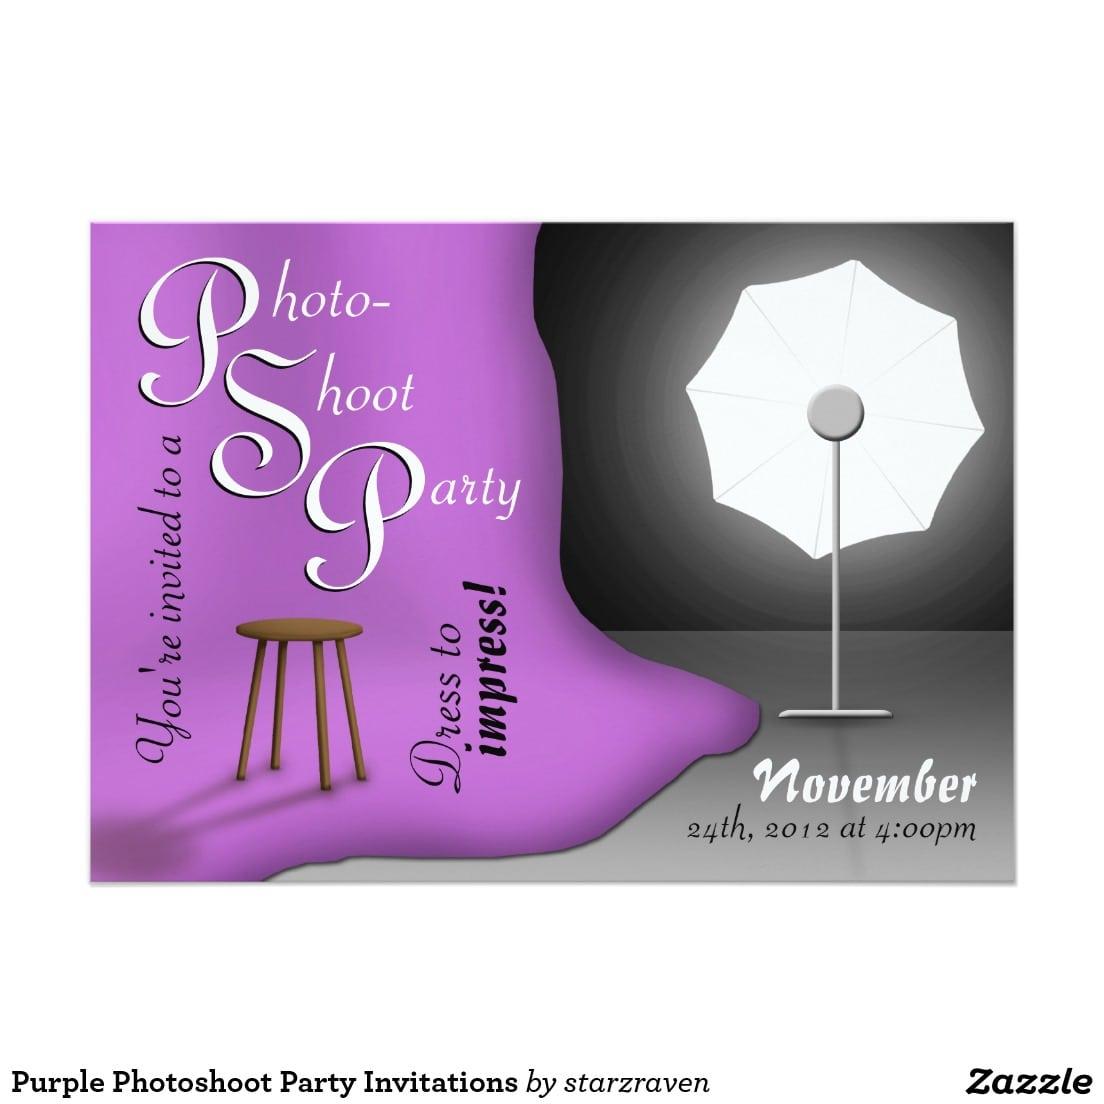 Photoshoot Party Invitations - Mickey Mouse Invitations Templates